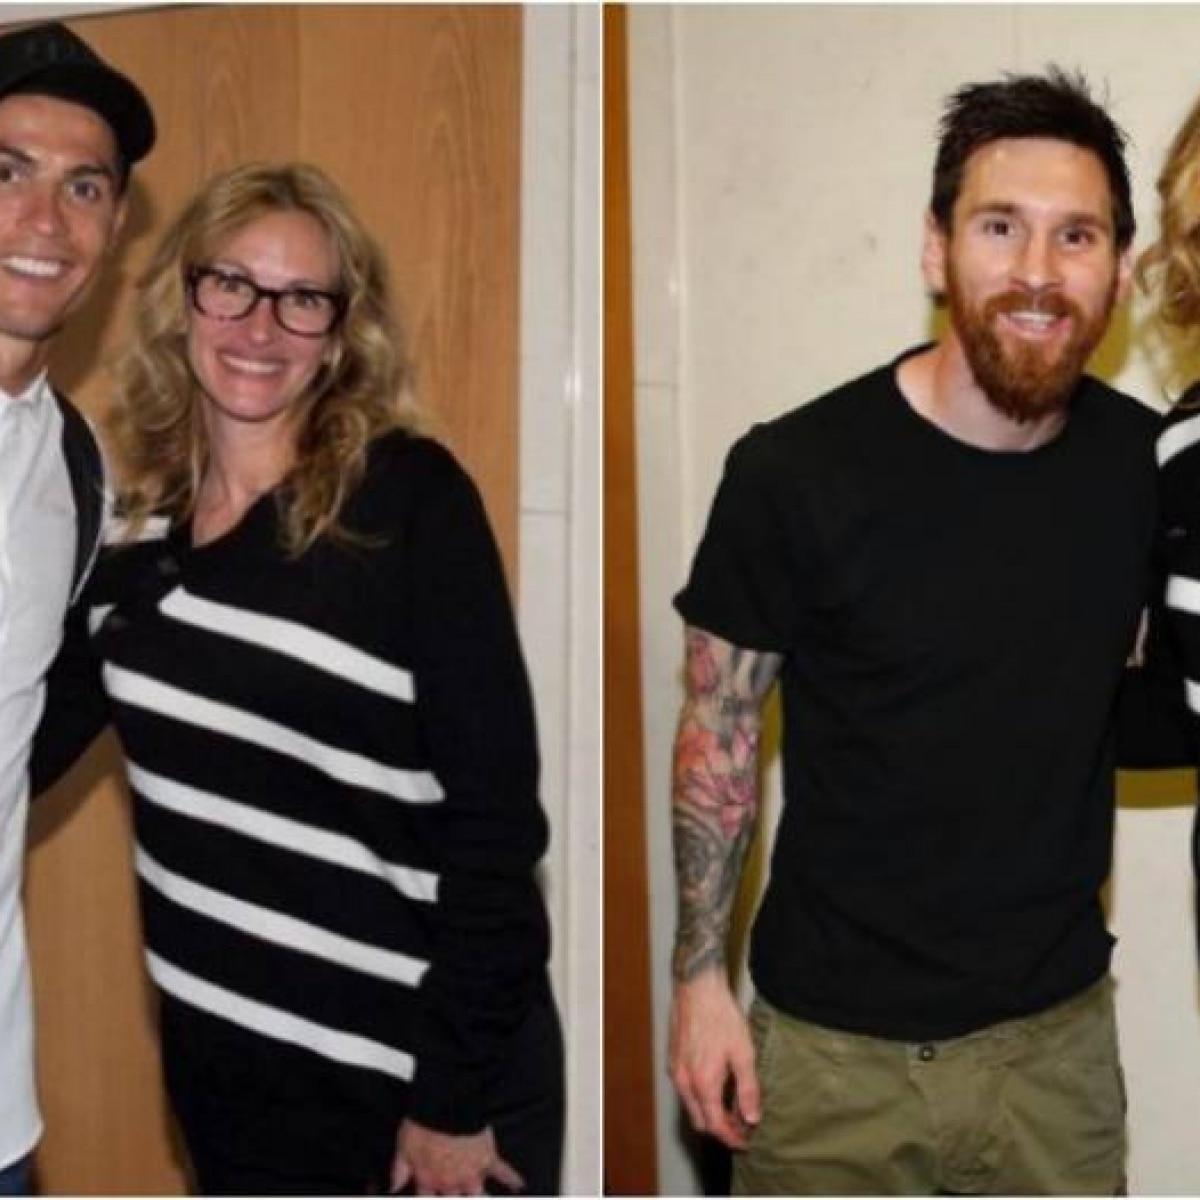 934e30ea53e15 Julia Roberts tieta Cristiano Ronaldo e Messi no Santiago Bernabéu -  Futebol - Fera